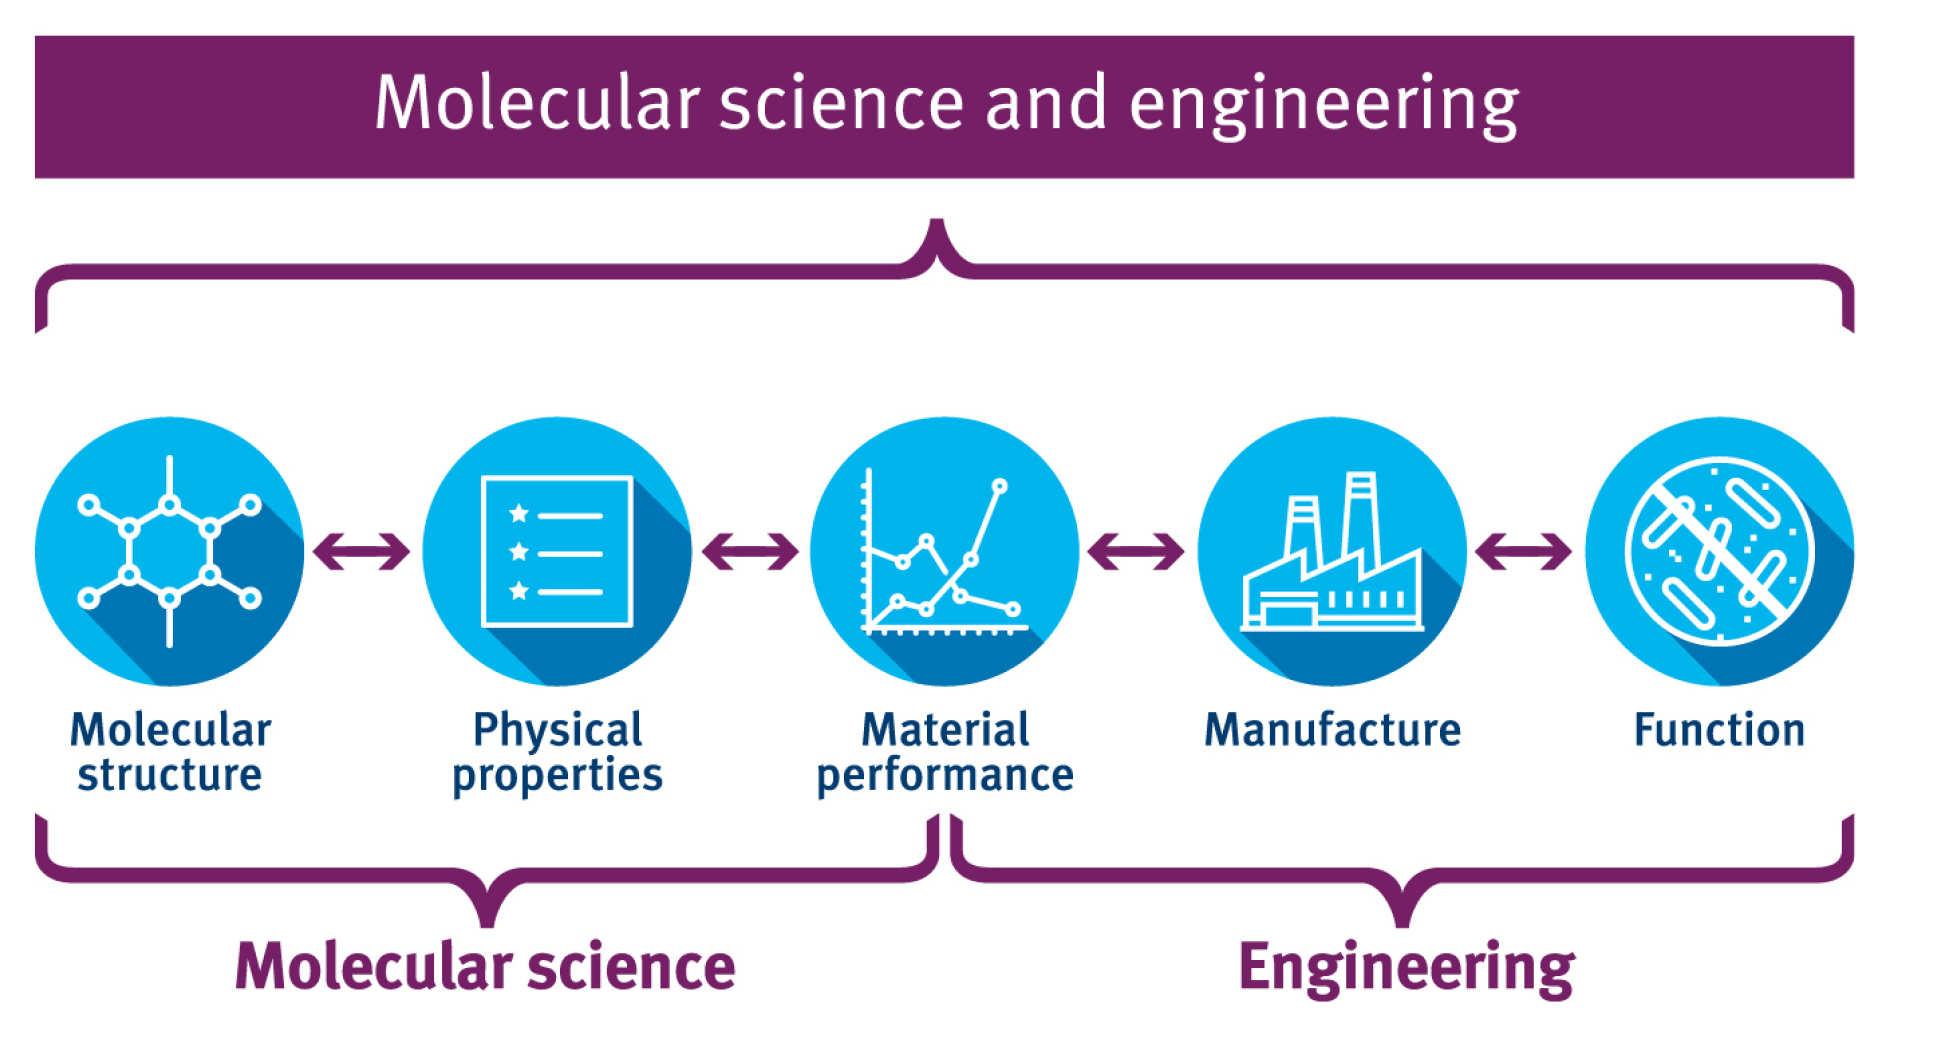 Transatlantic collaborations in molecular science and engineering ...